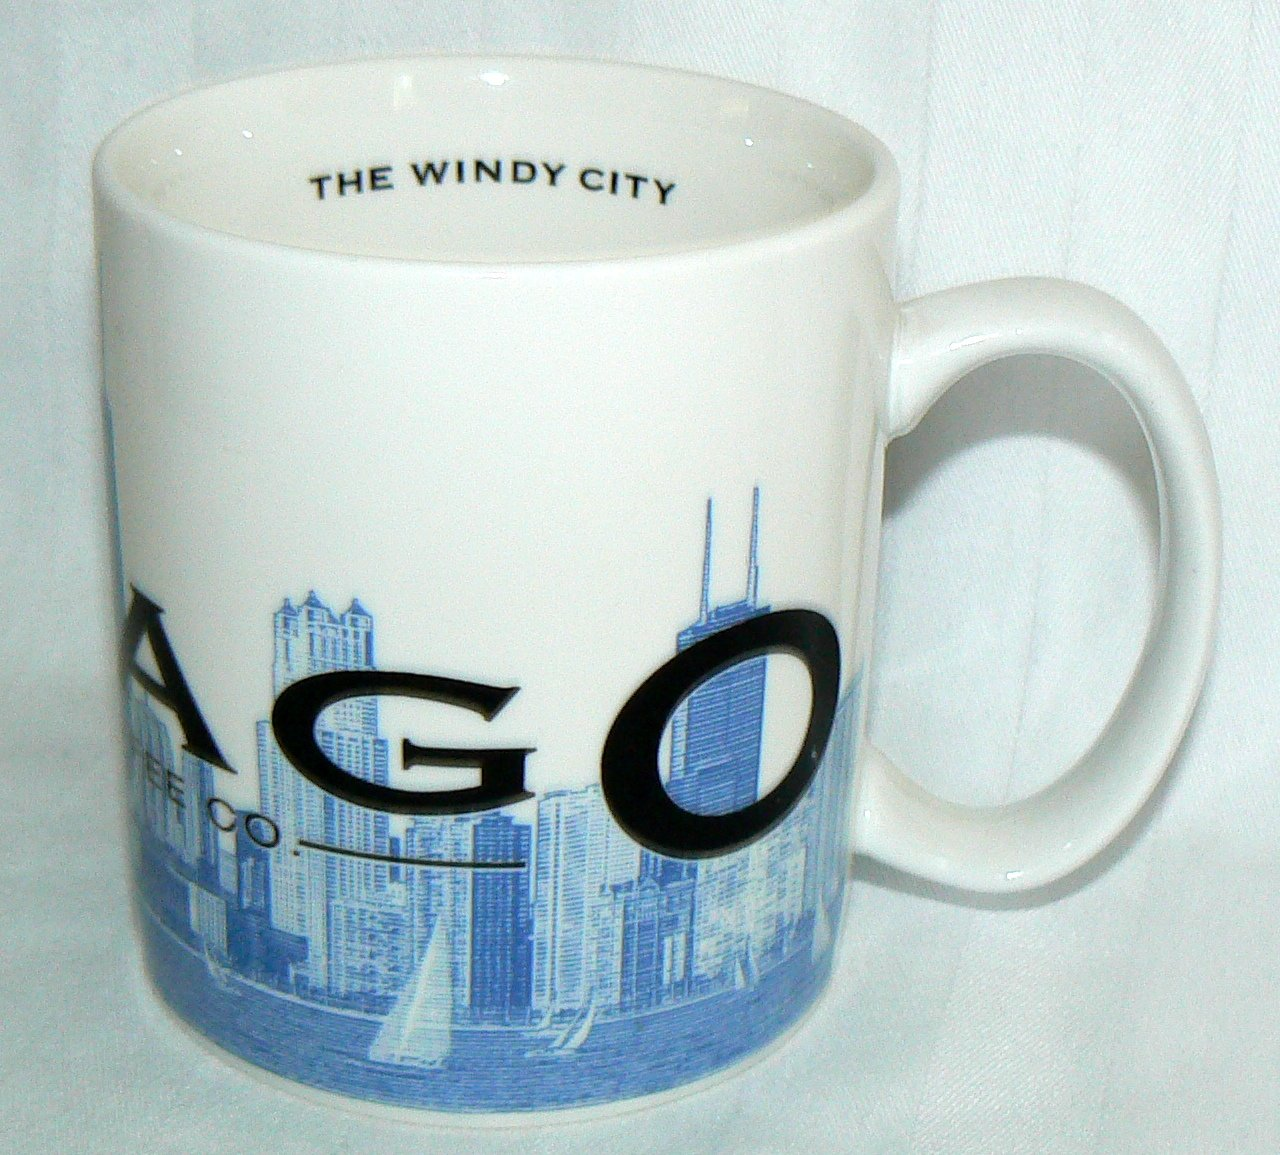 16bee7d96cc Amazon.com | Starbucks Coffee 2002 Skyline Mug Chicago 16 oz.: Coffee Cups: Coffee  Cups & Mugs